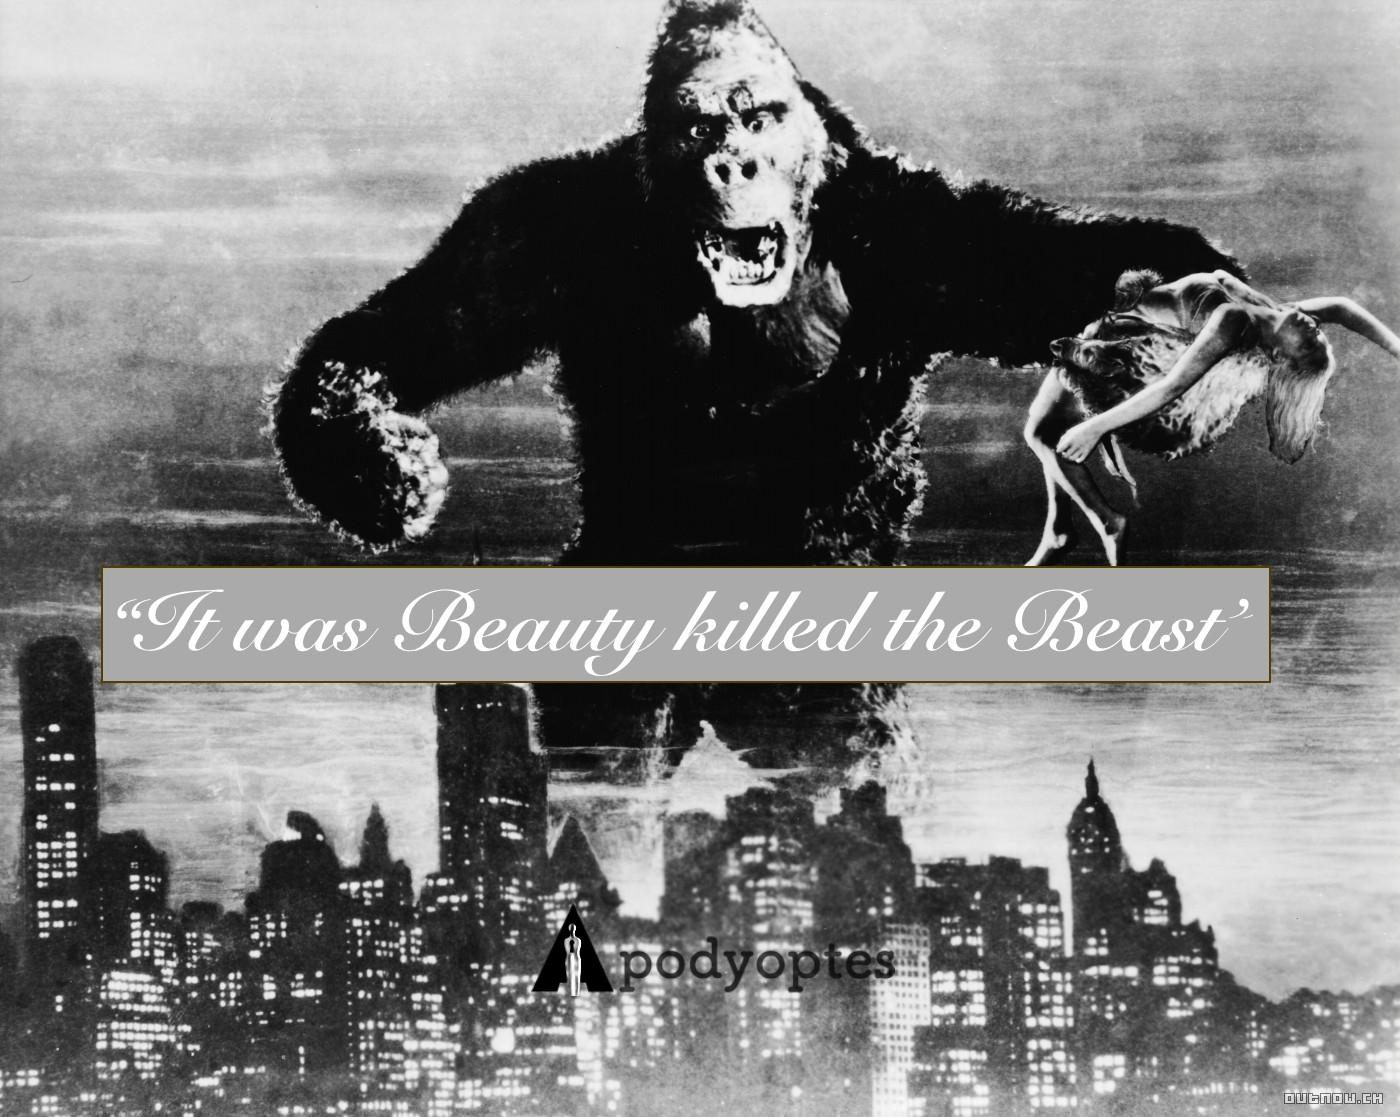 Famous Movie Quotes: \u201cKing Kong\u201d 1933 \u2013 APODYOPTES